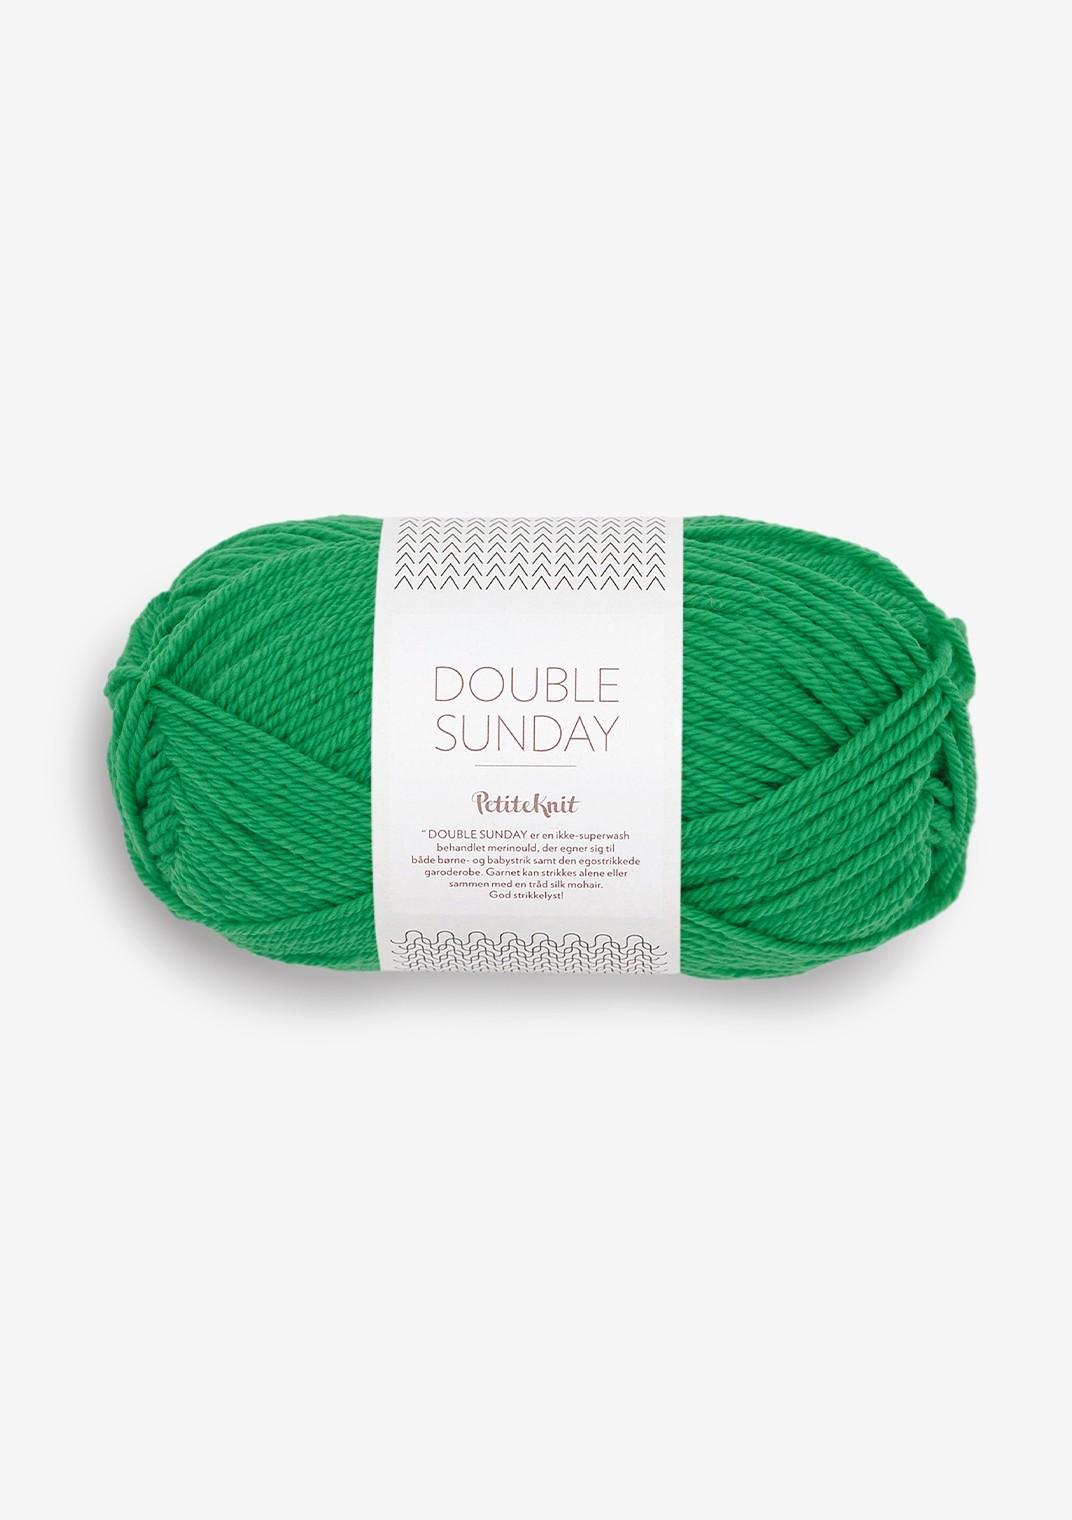 8236 statement green Double Sunday PetiteKnit